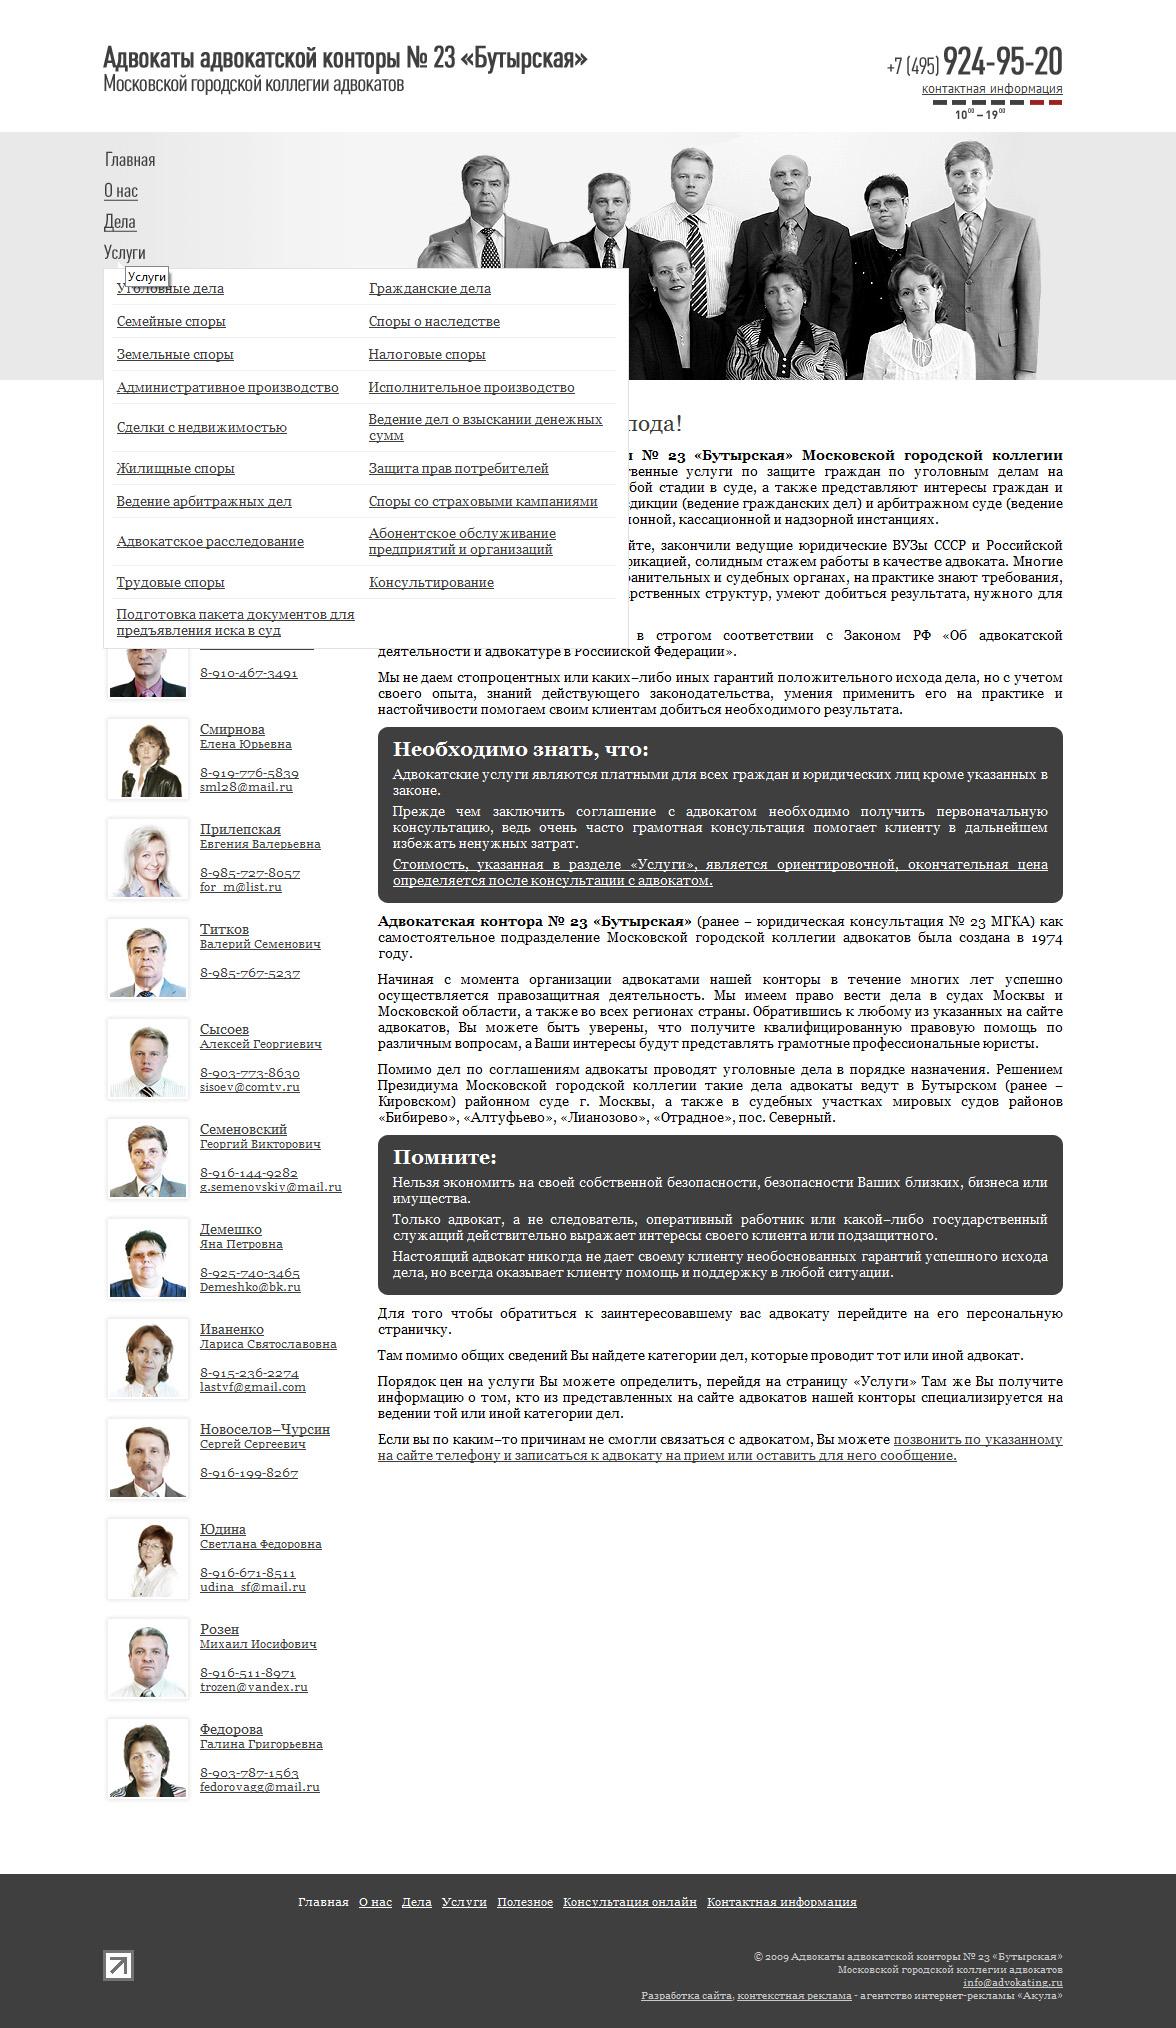 Адвокаты конторы № 23 «Бутырская»